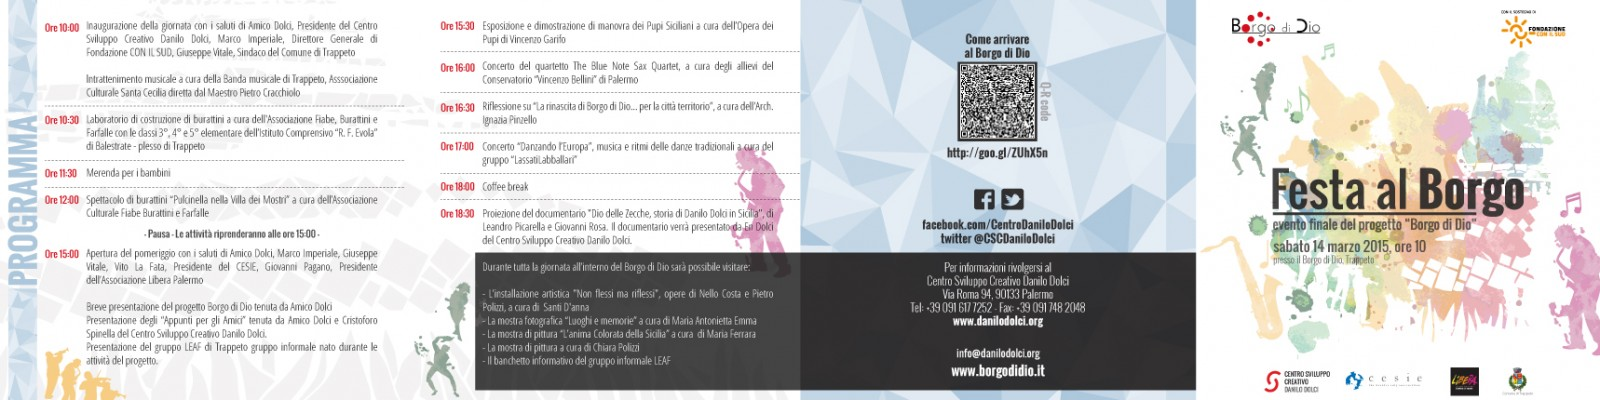 brochure-festa-borgo-1